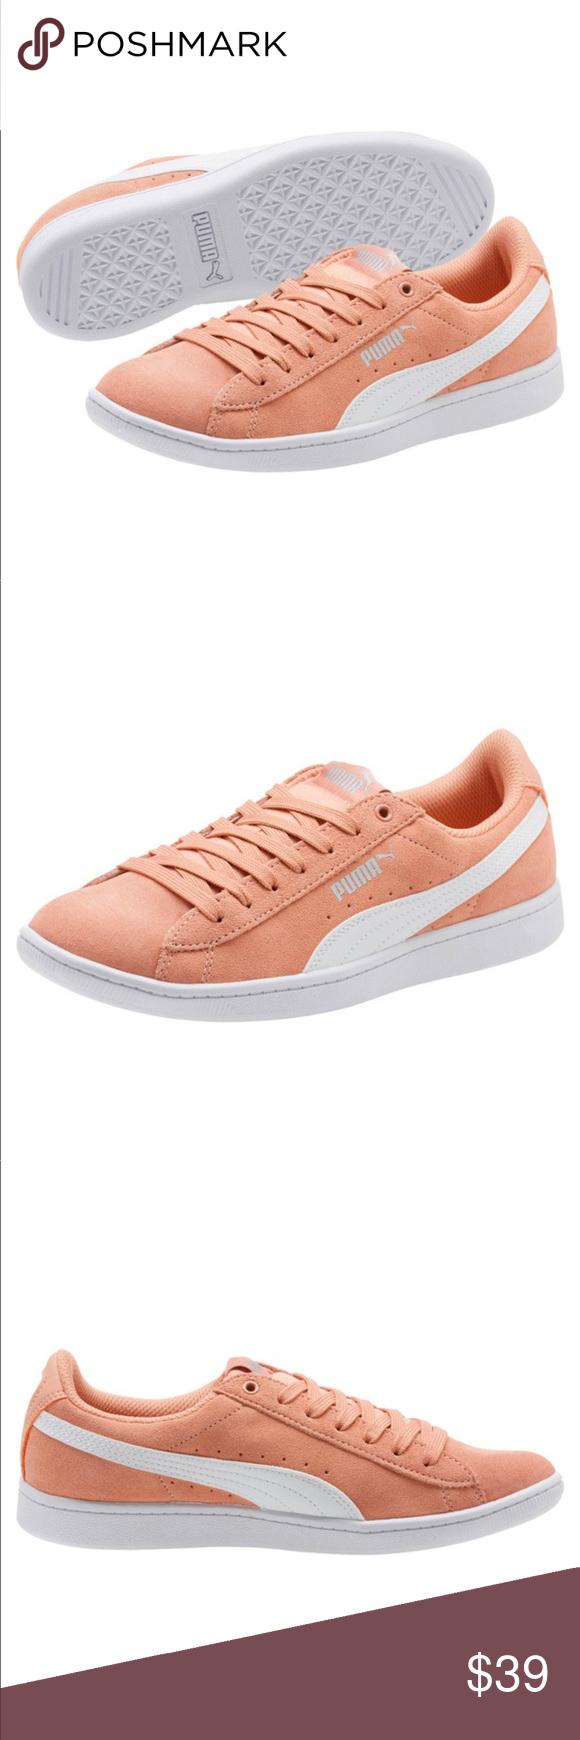 Coral Puma Vikky Softfoam Women's Sneaker 6.5 Brand New In